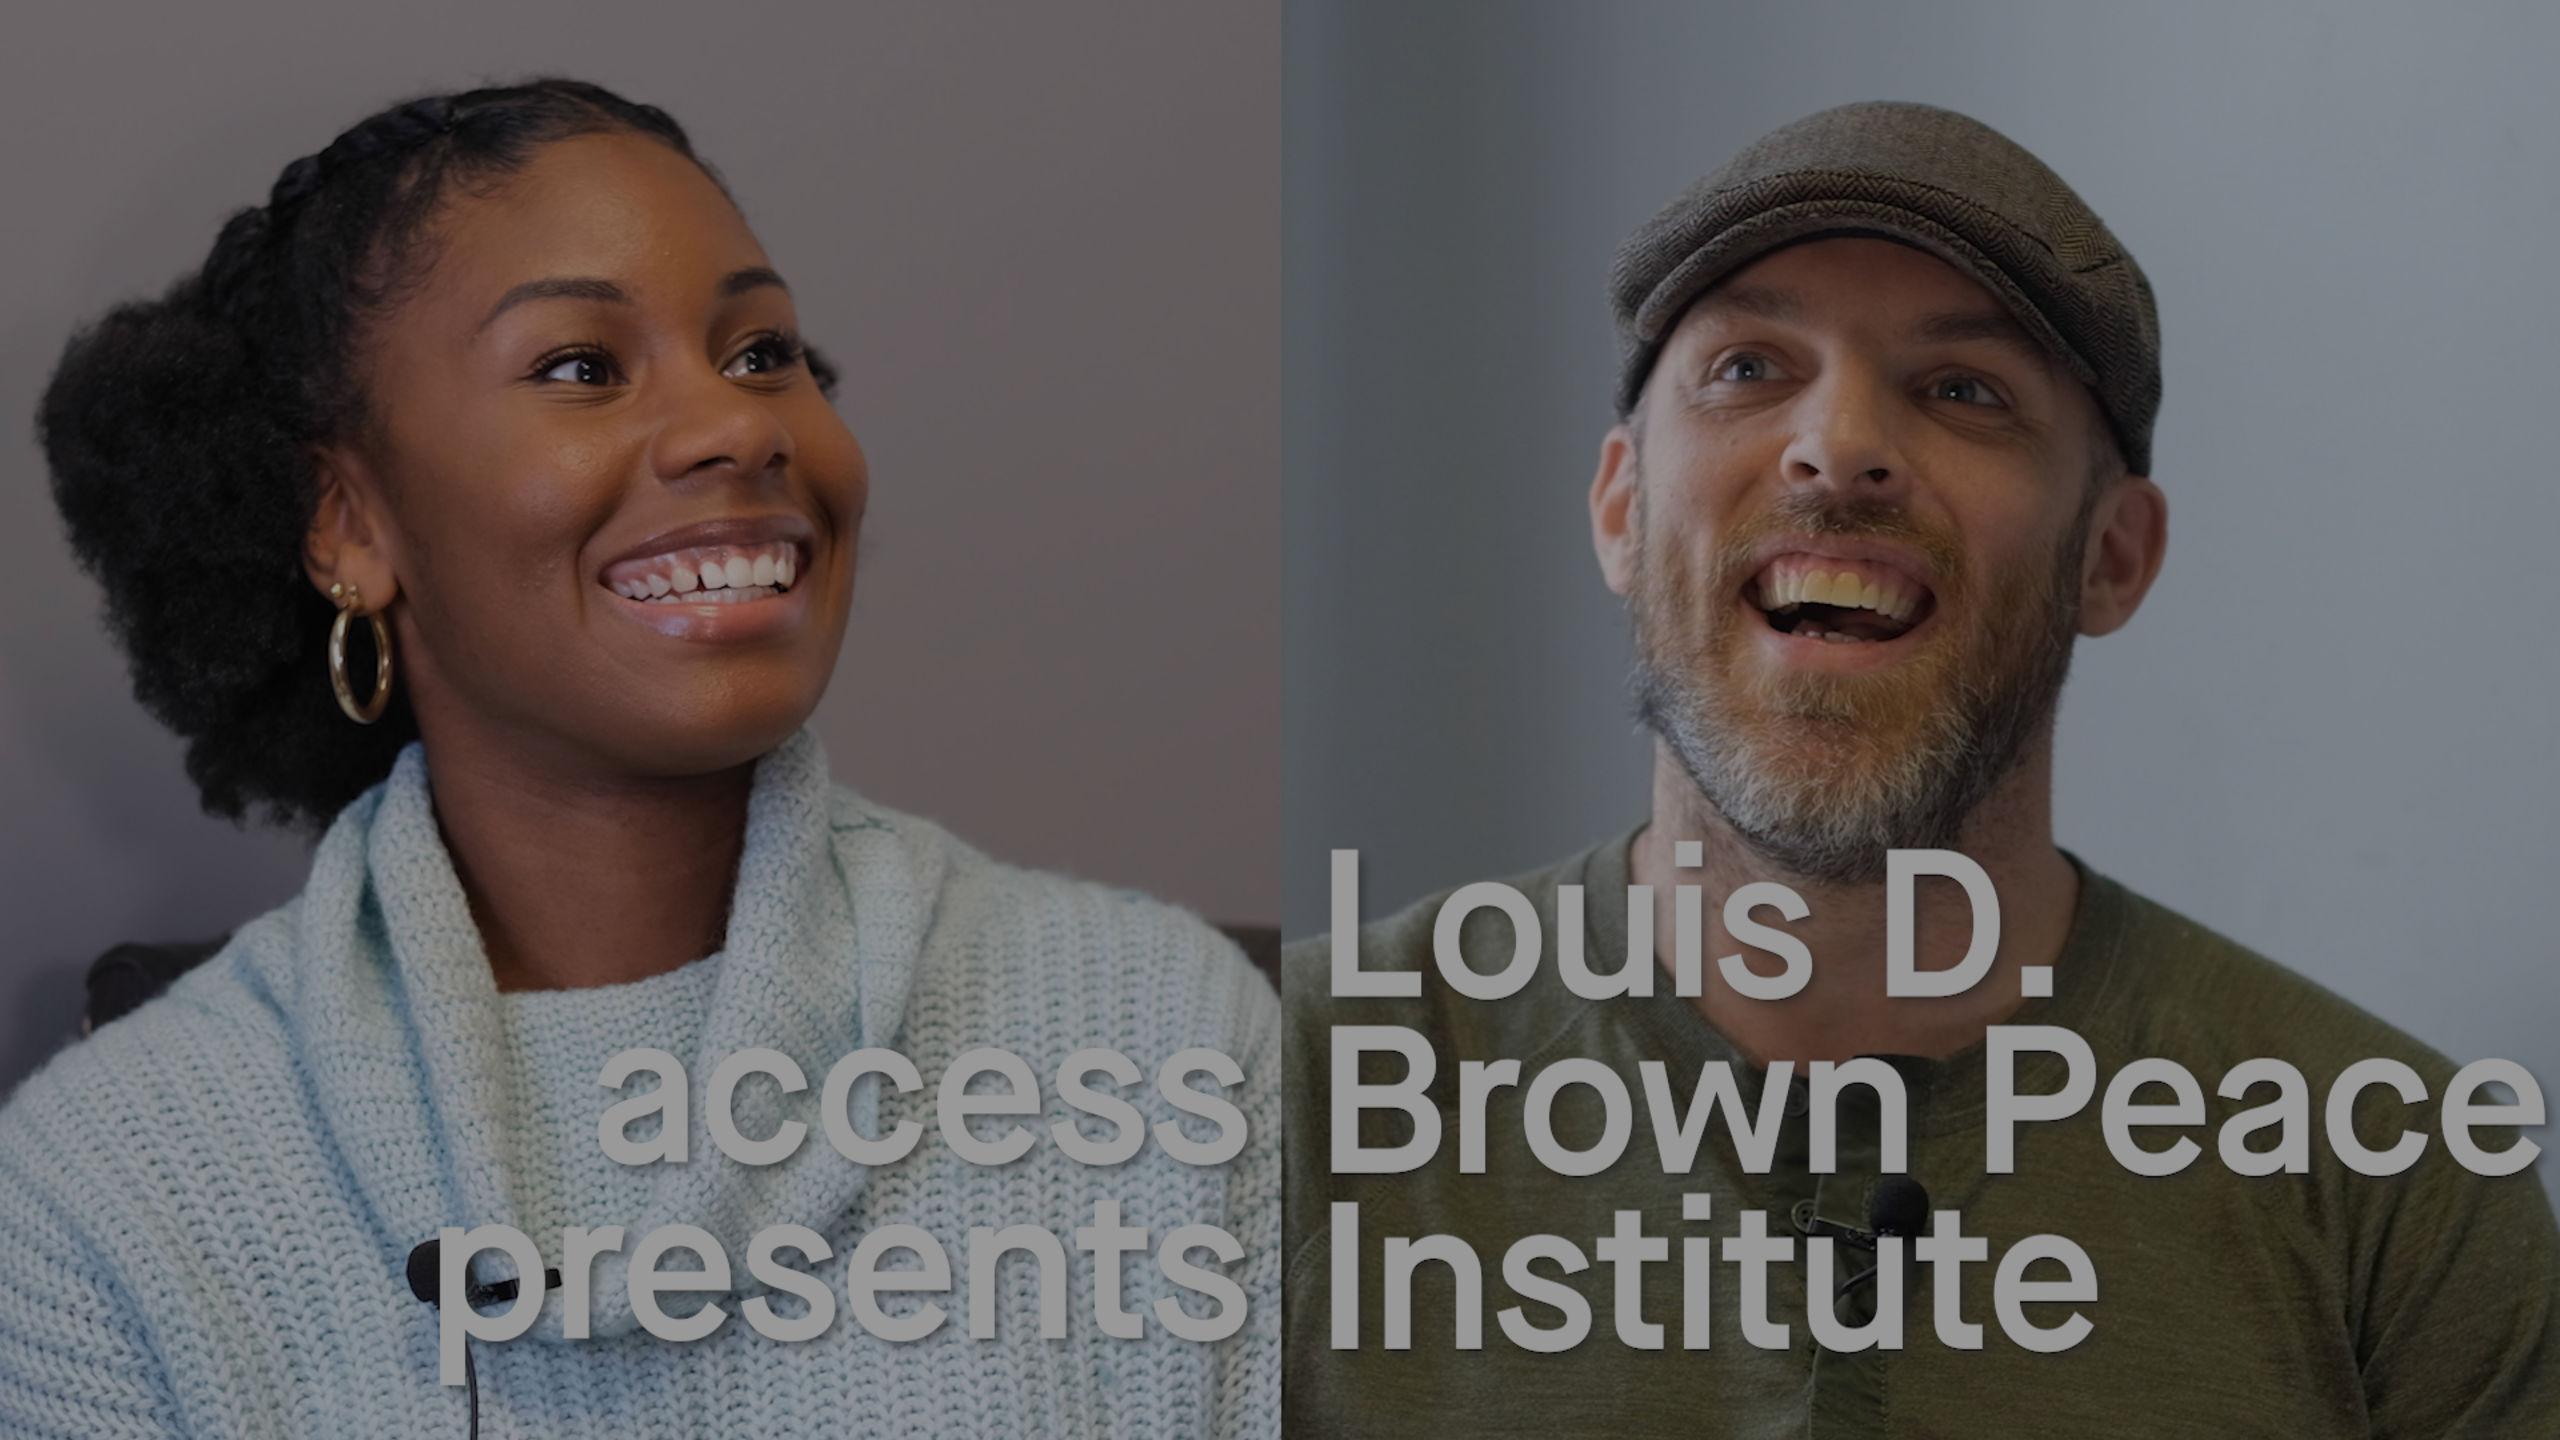 Louis D. Brown Peace Institute Interview